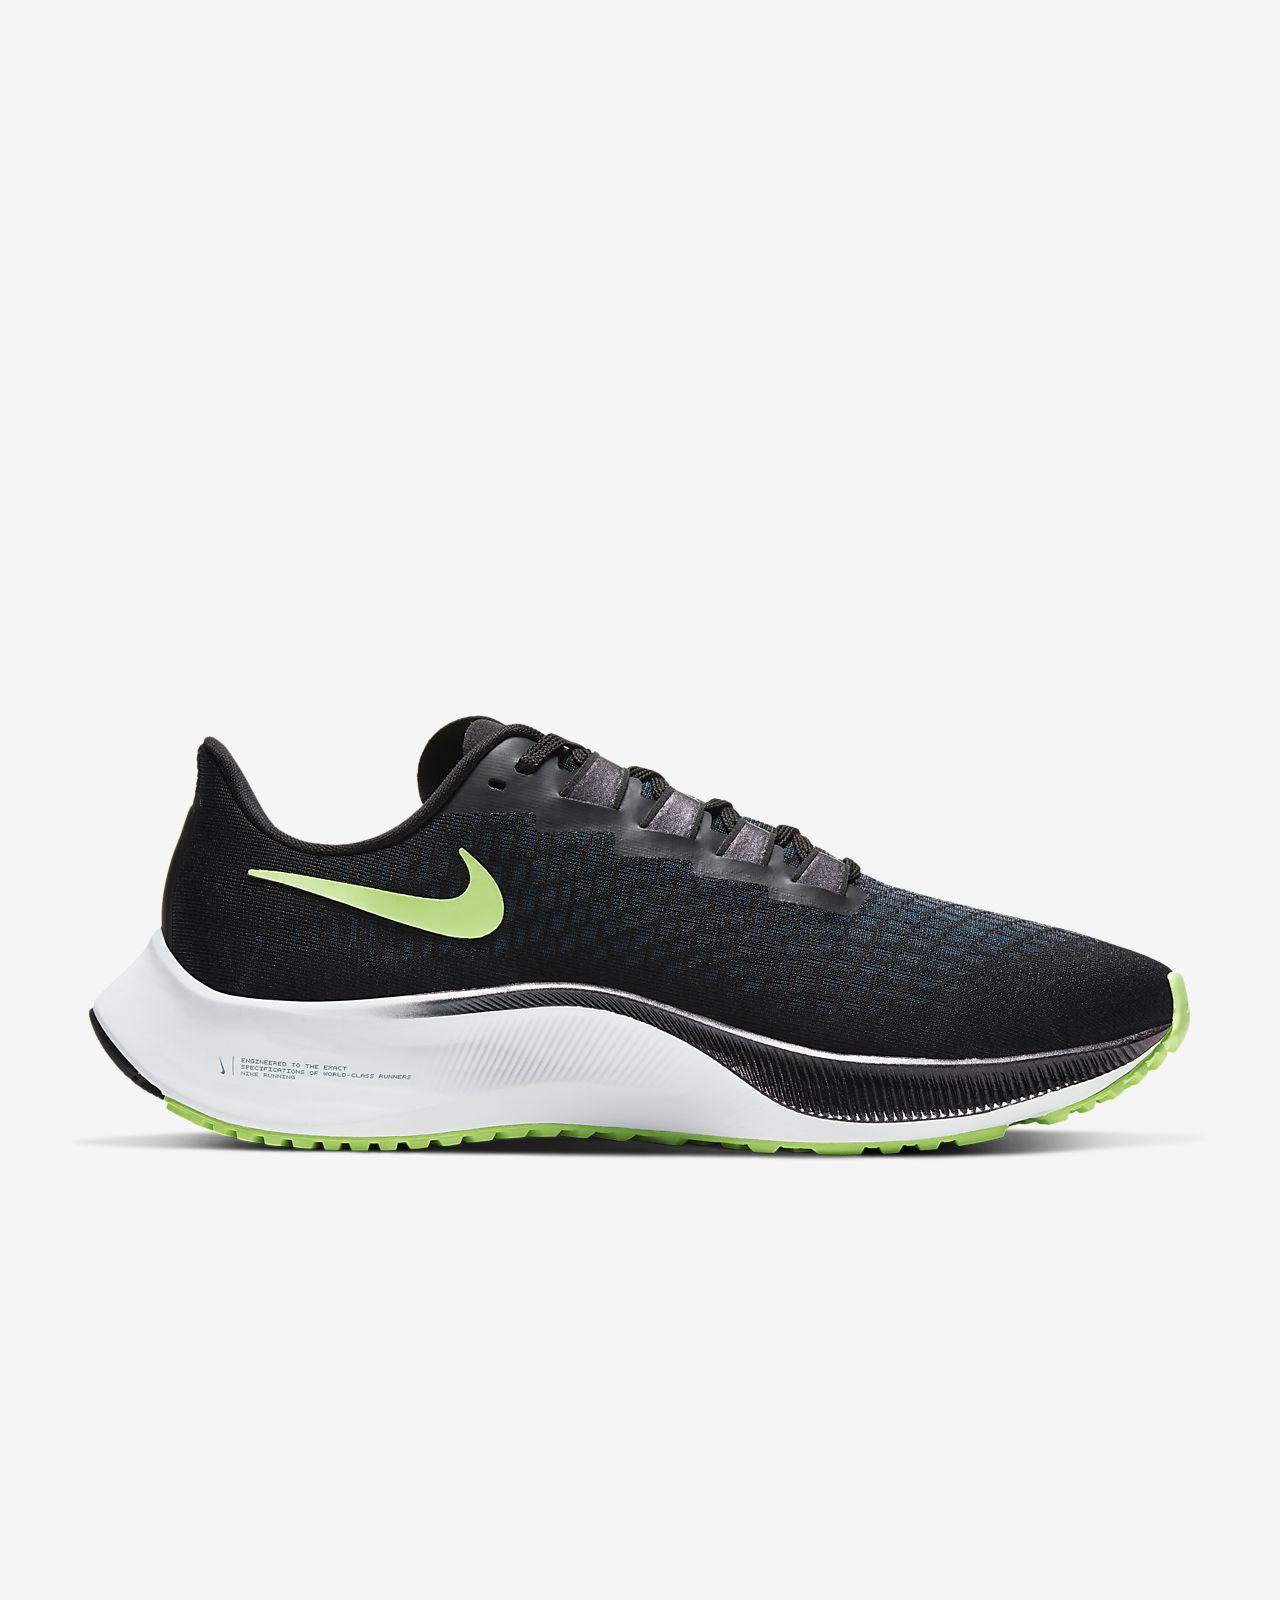 Nike | Running Shoes, Clothing